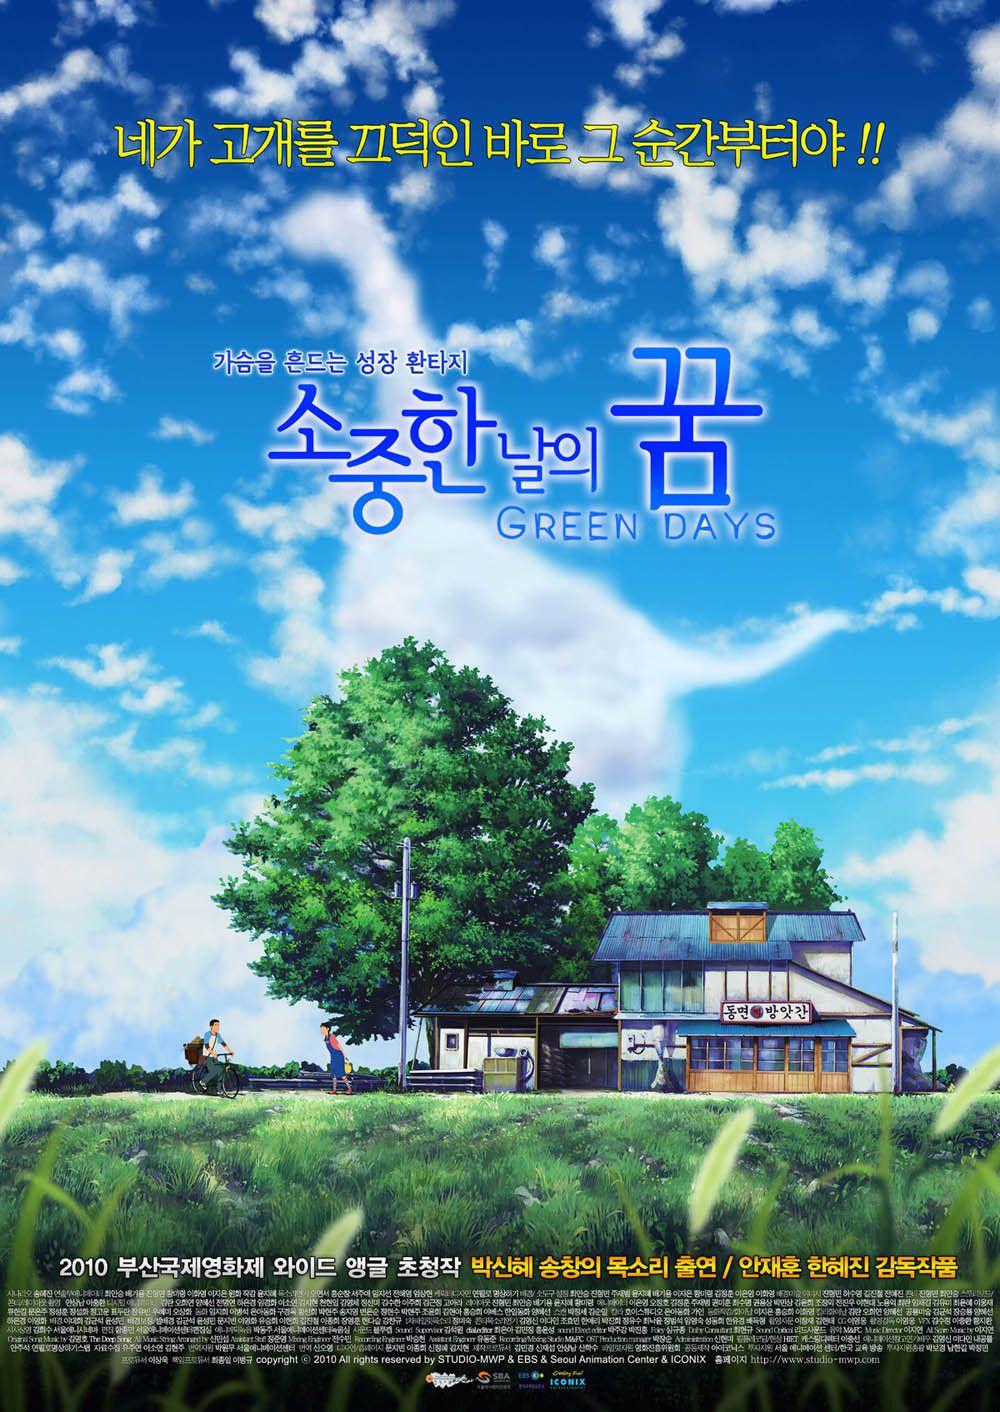 Green Days - Dinosaur And I - Film (2011)